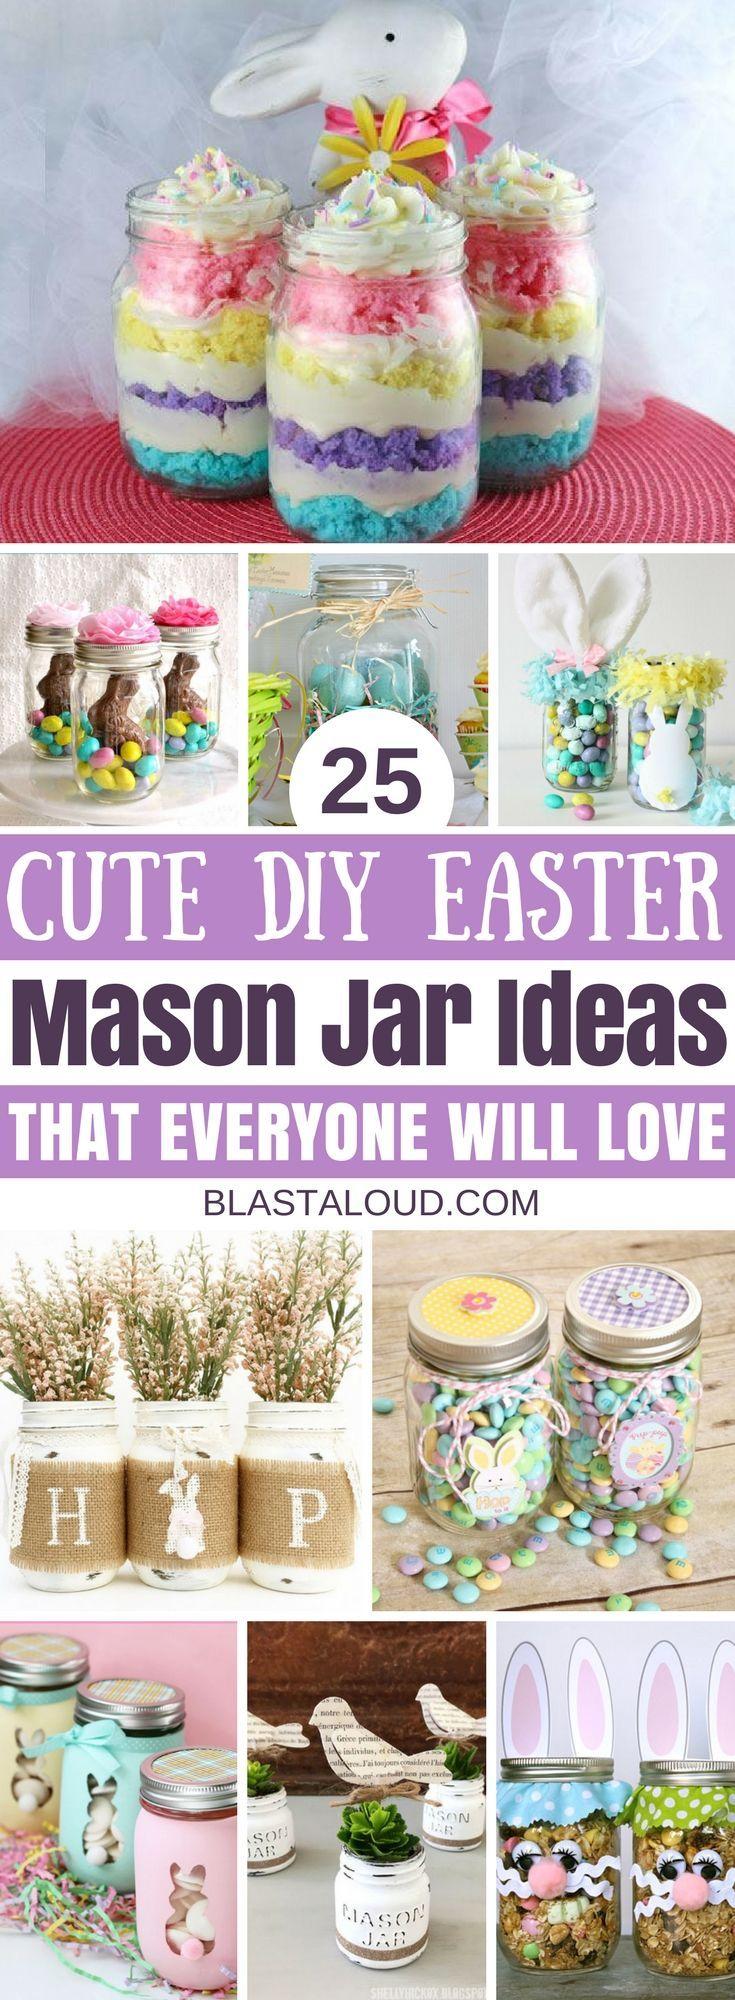 25 Pretty Easter Decor Ideas You'll Love advise